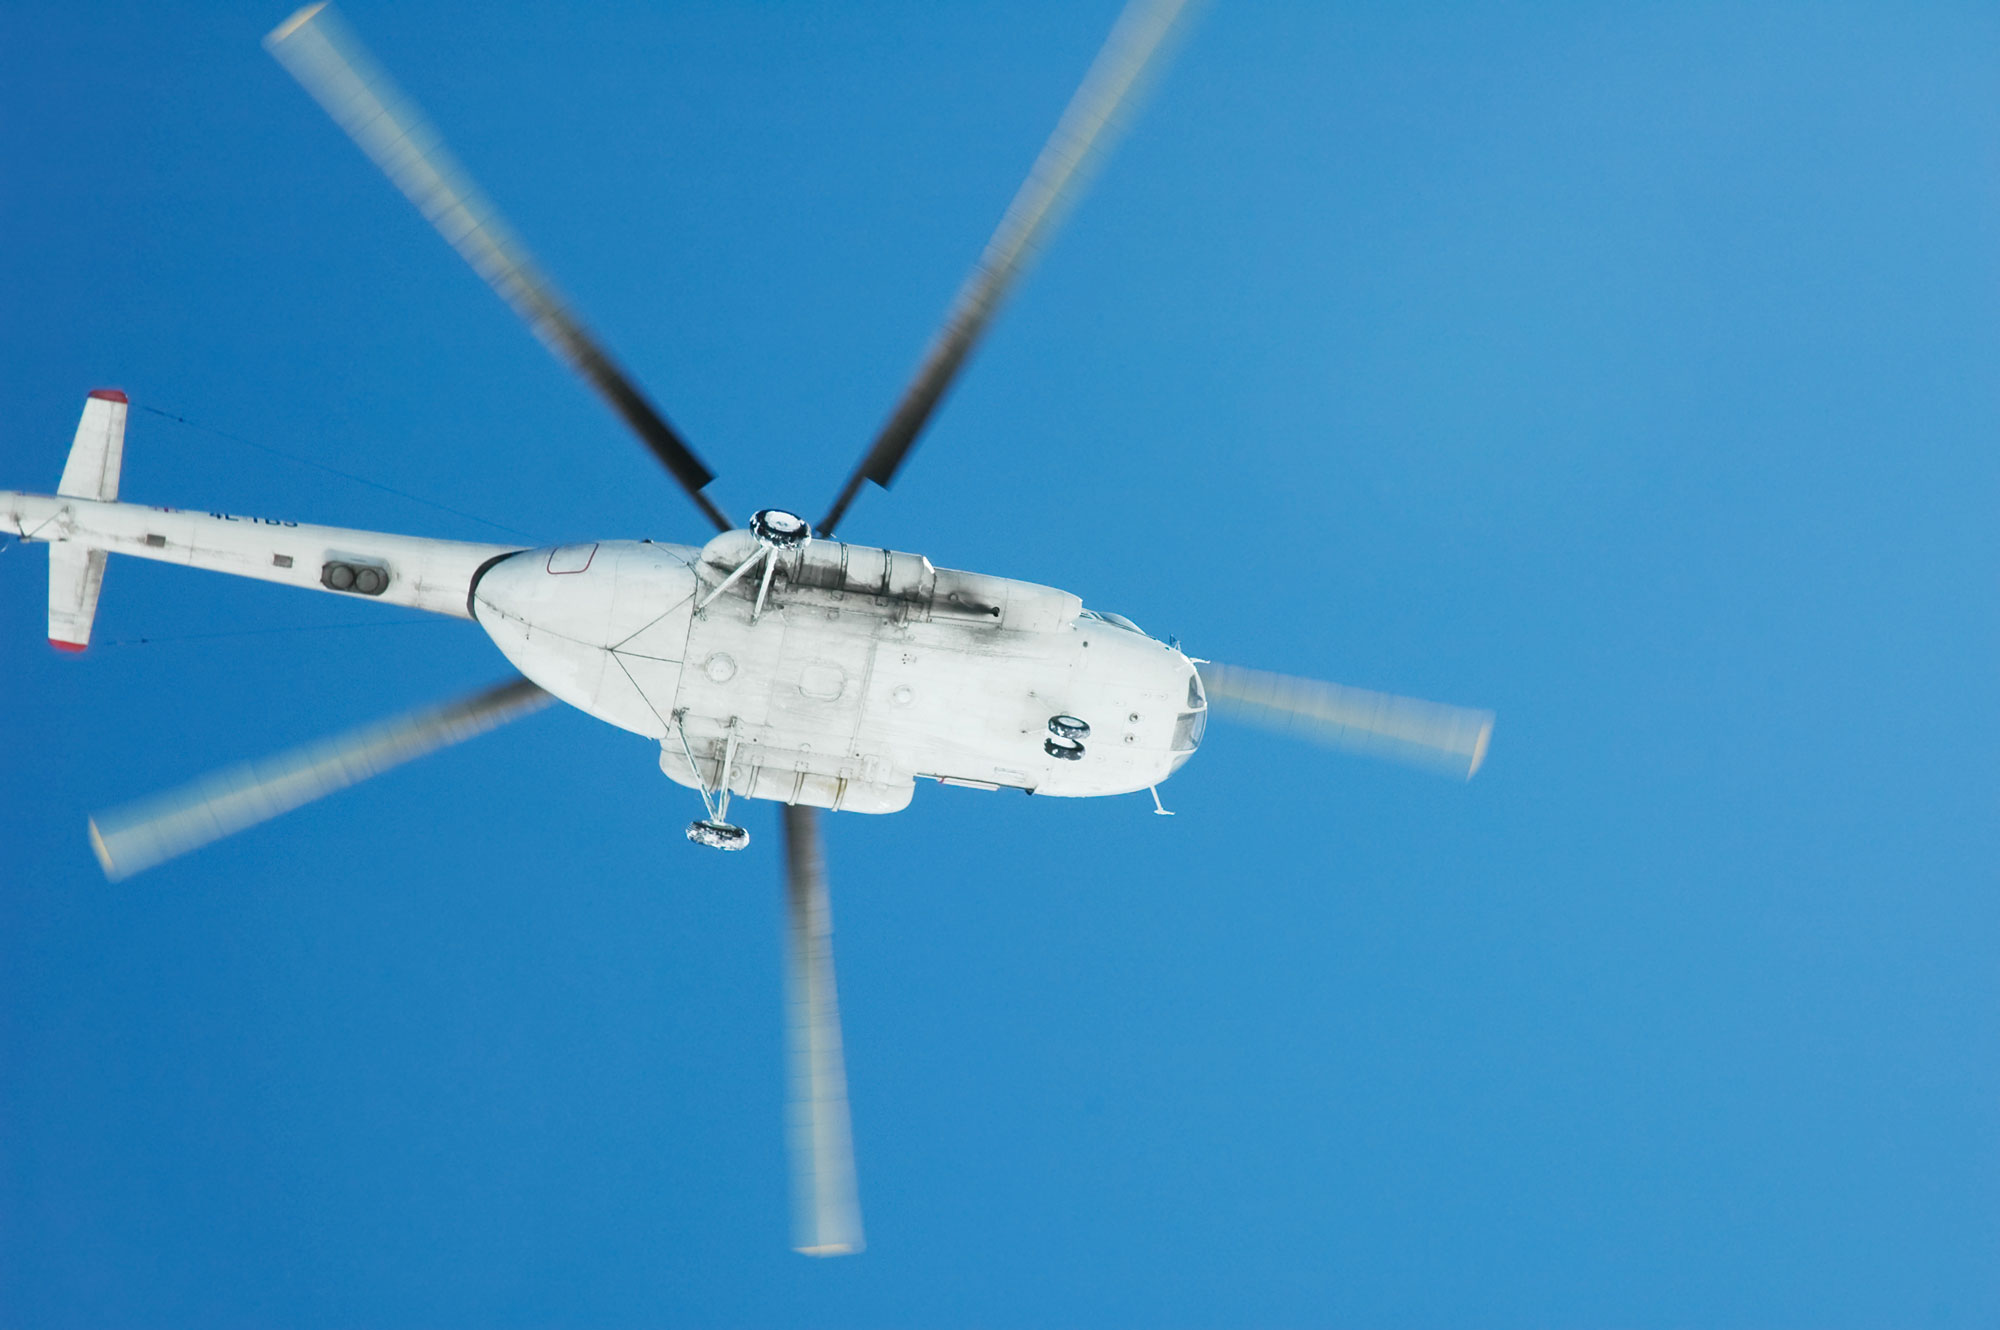 European Cockpit Association Eca: ECA Helicopter Pilots On A Mission